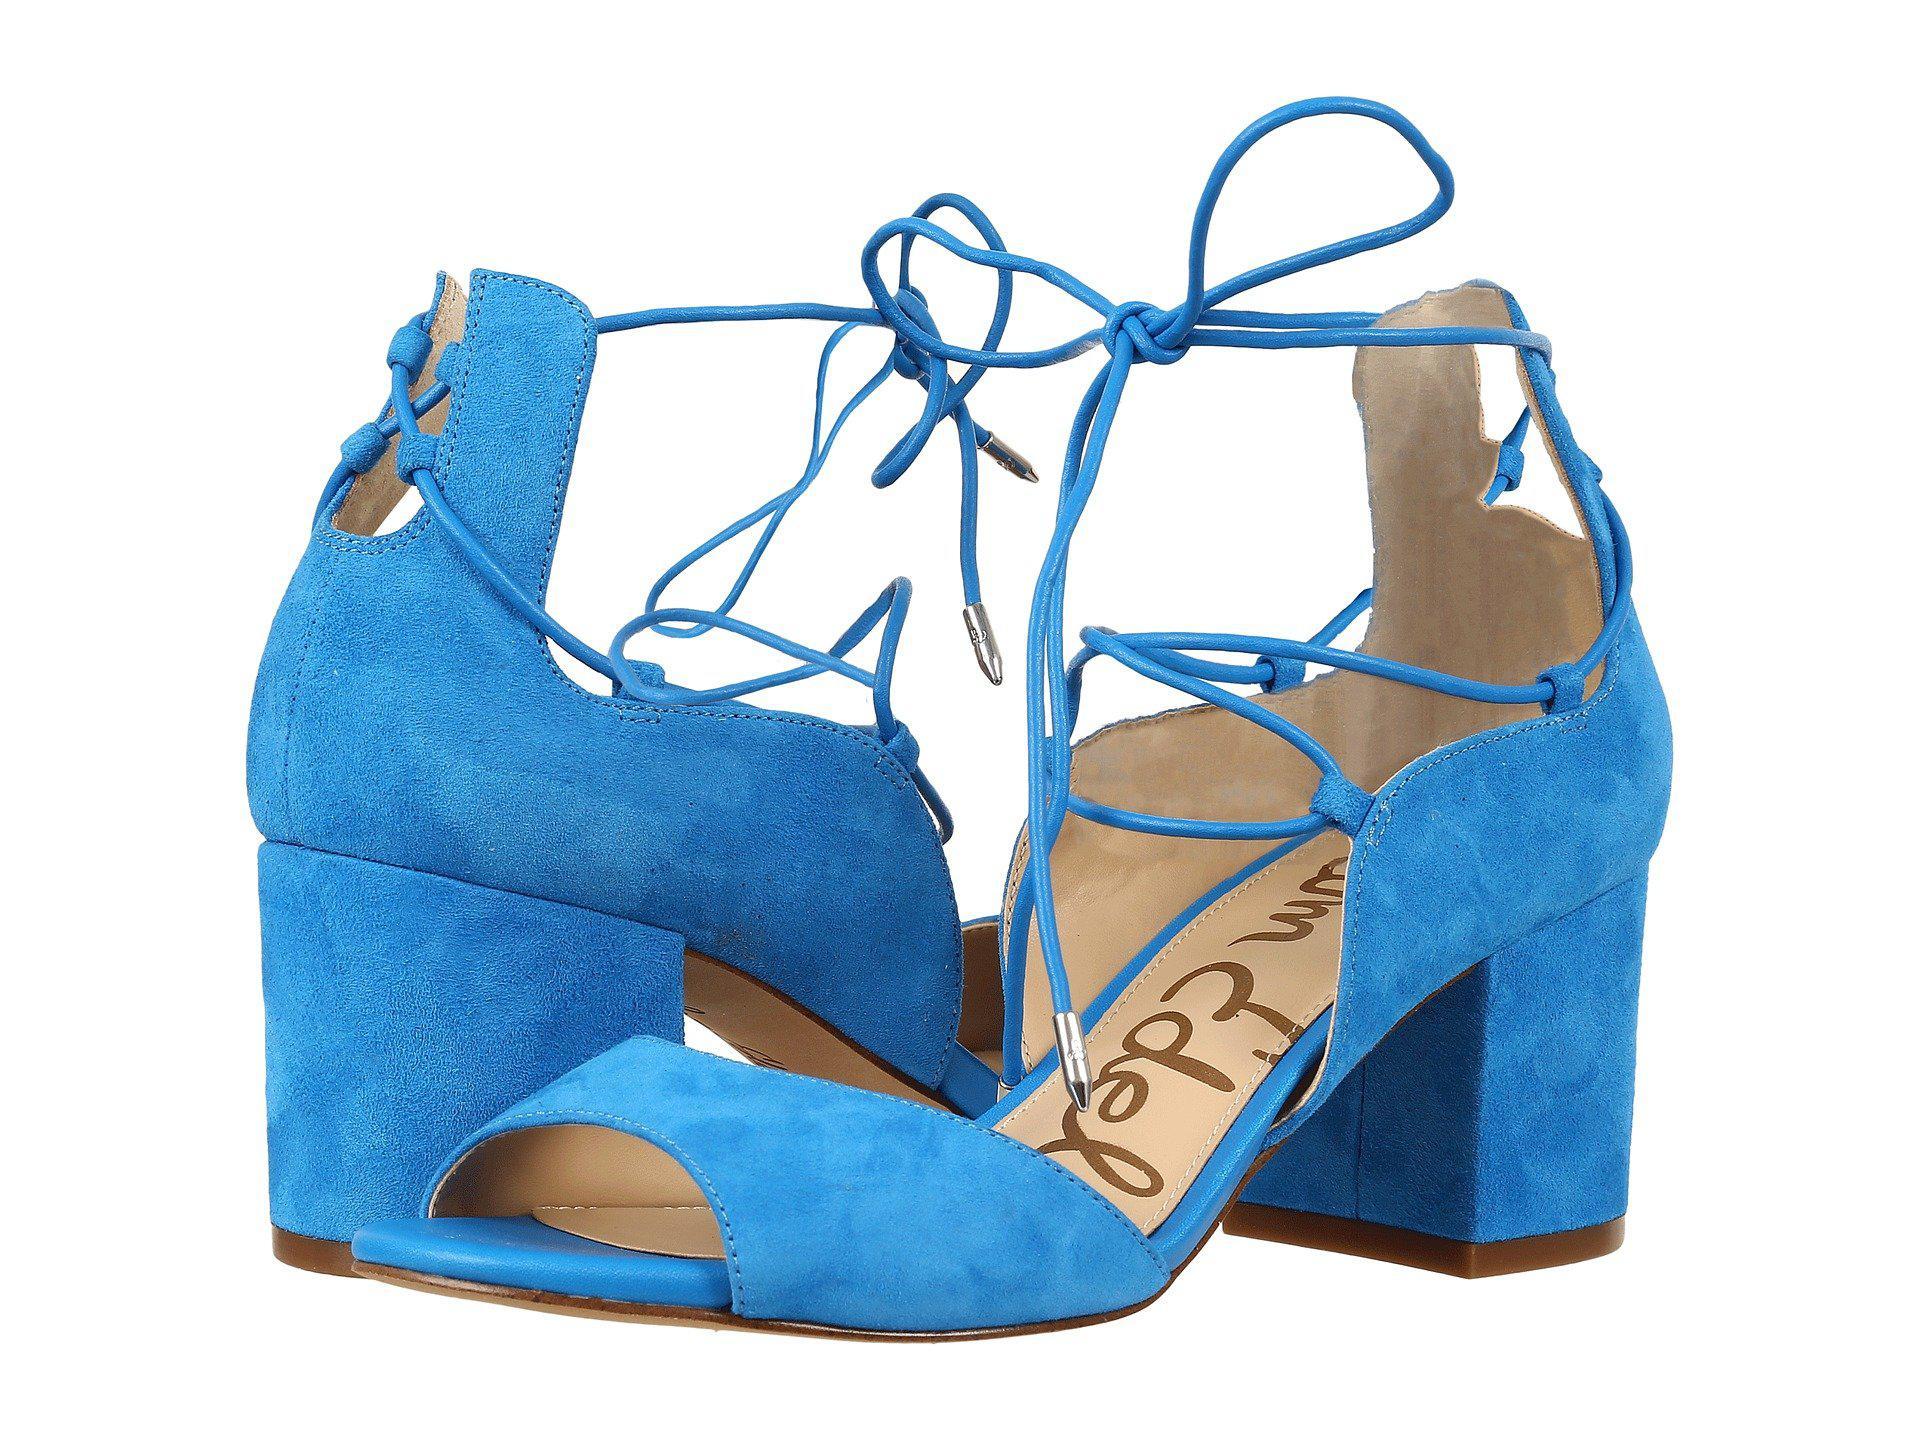 2851da7f2 Lyst - Sam Edelman Serene Dress Sandal in Blue - Save 33%